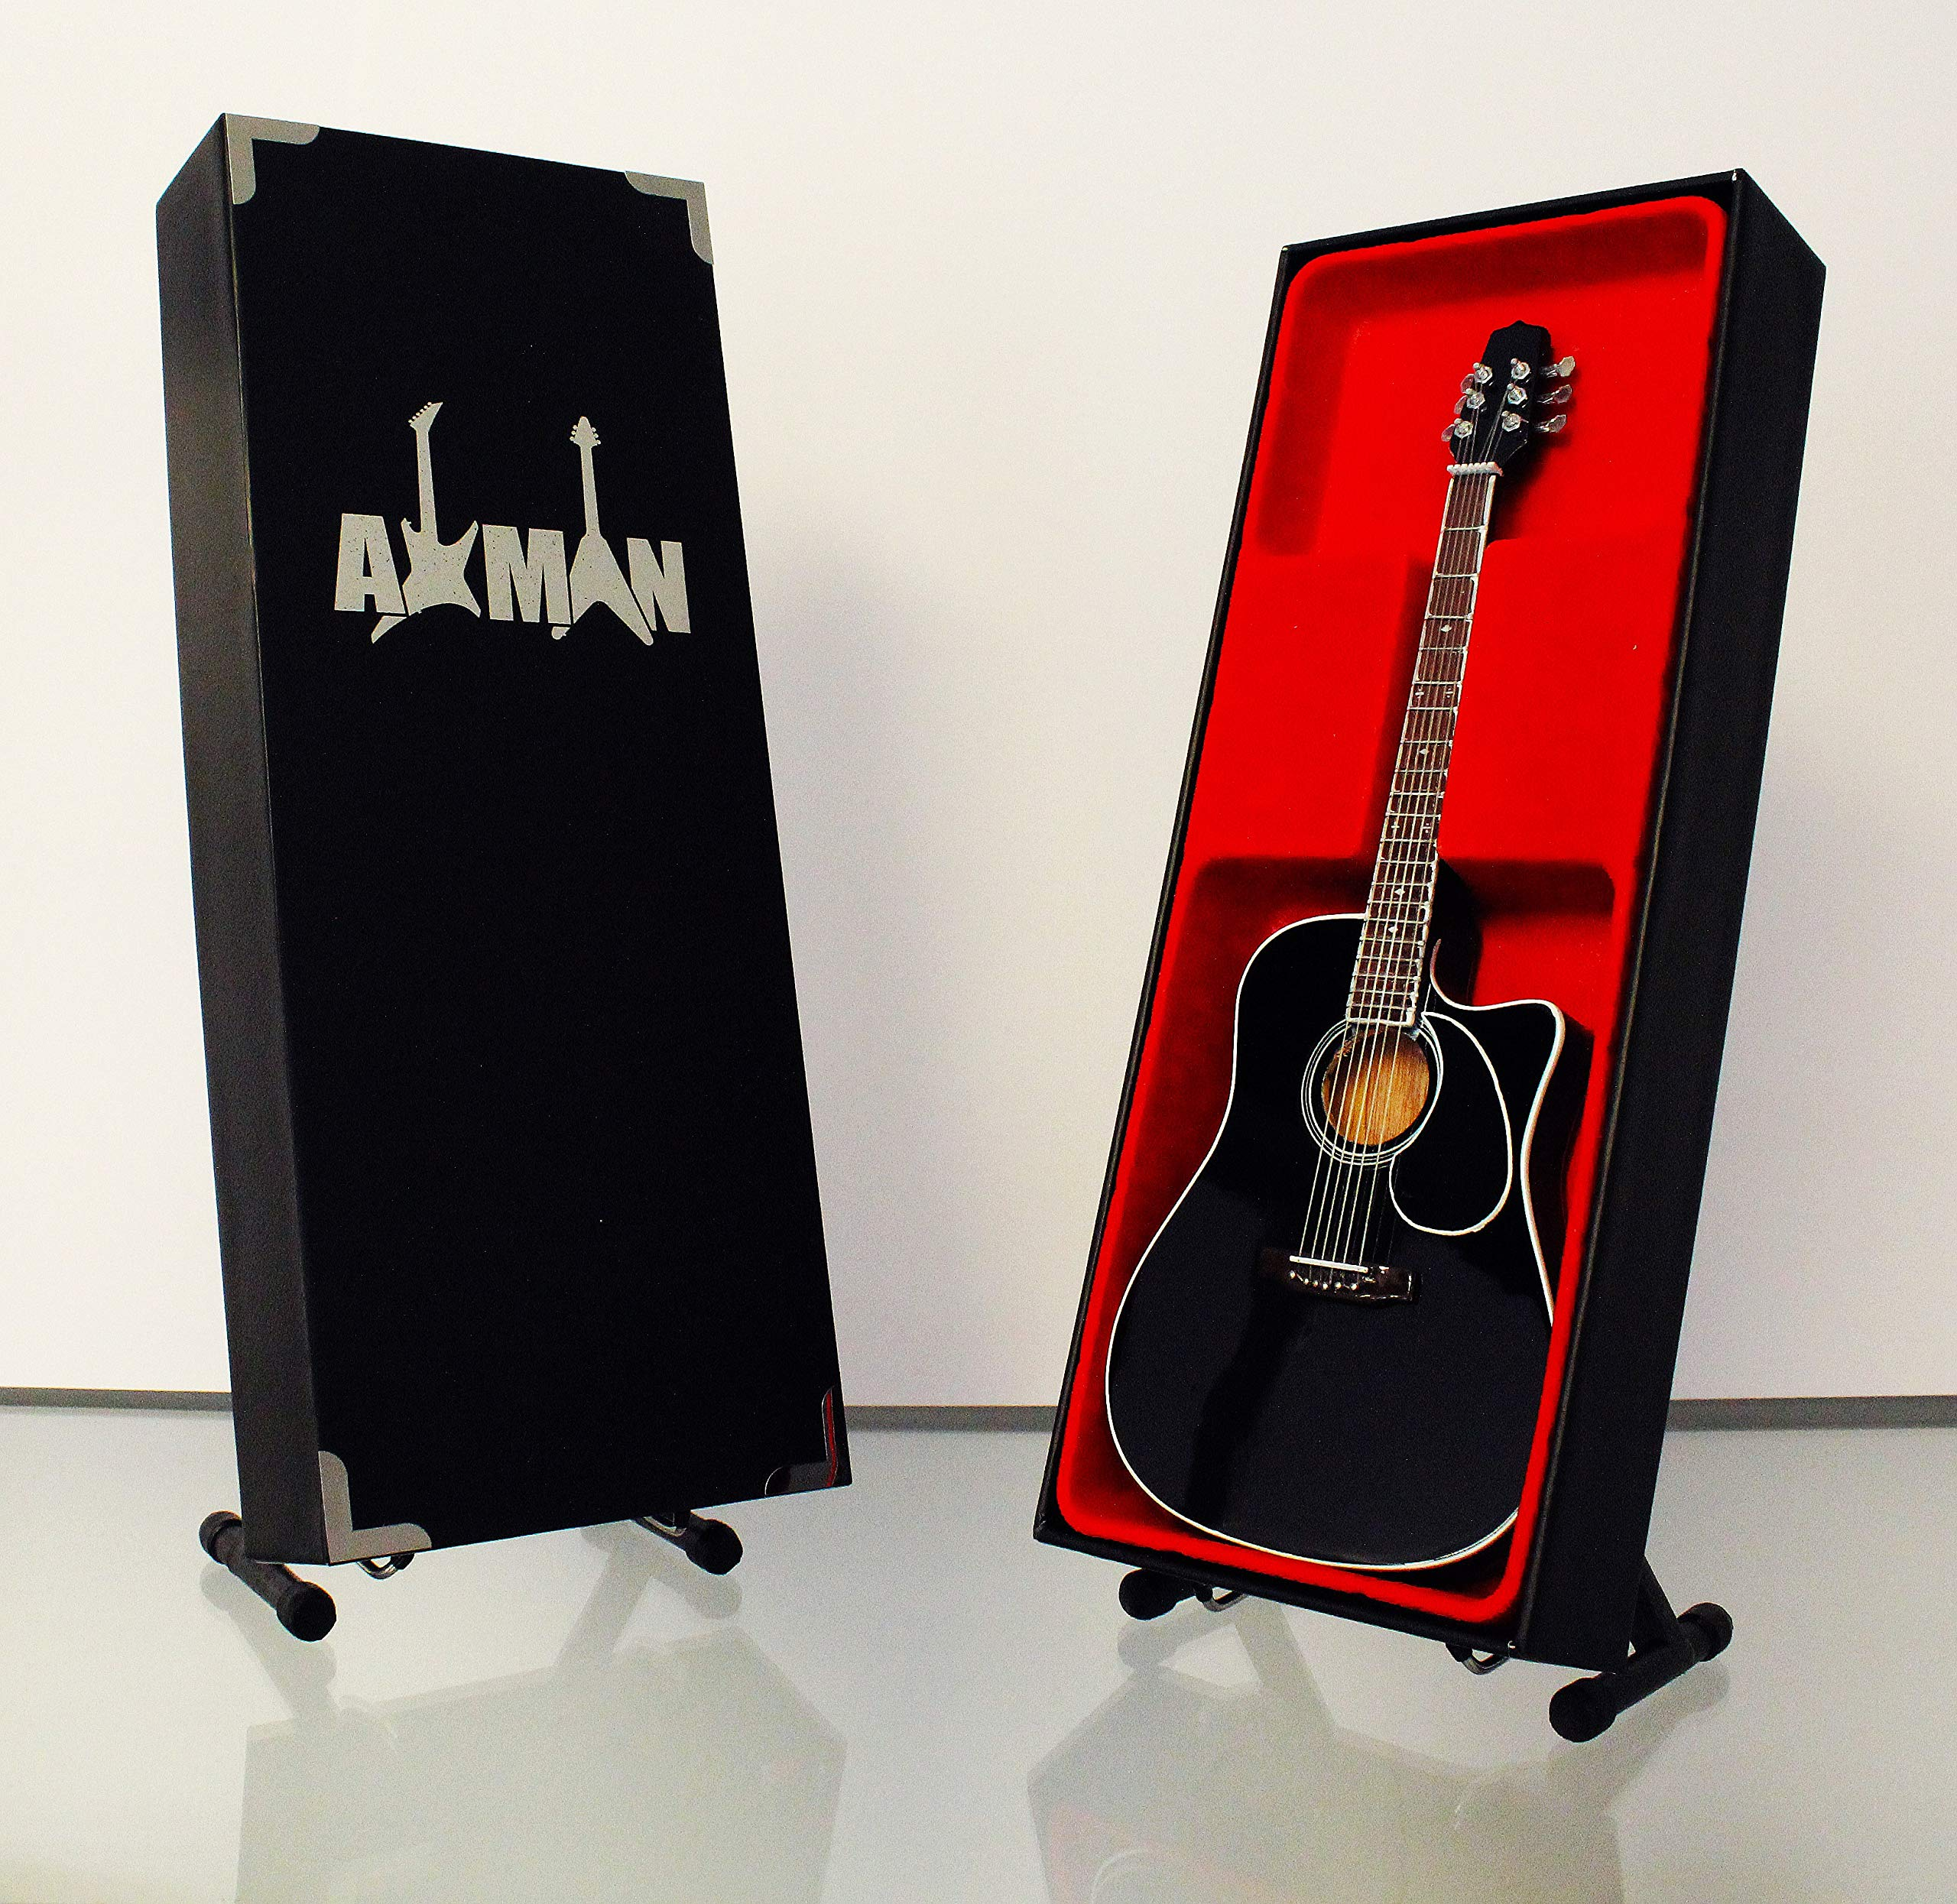 Miniatura Guitarra Replica: Jon Bon Jovi: Amazon.es: Instrumentos ...